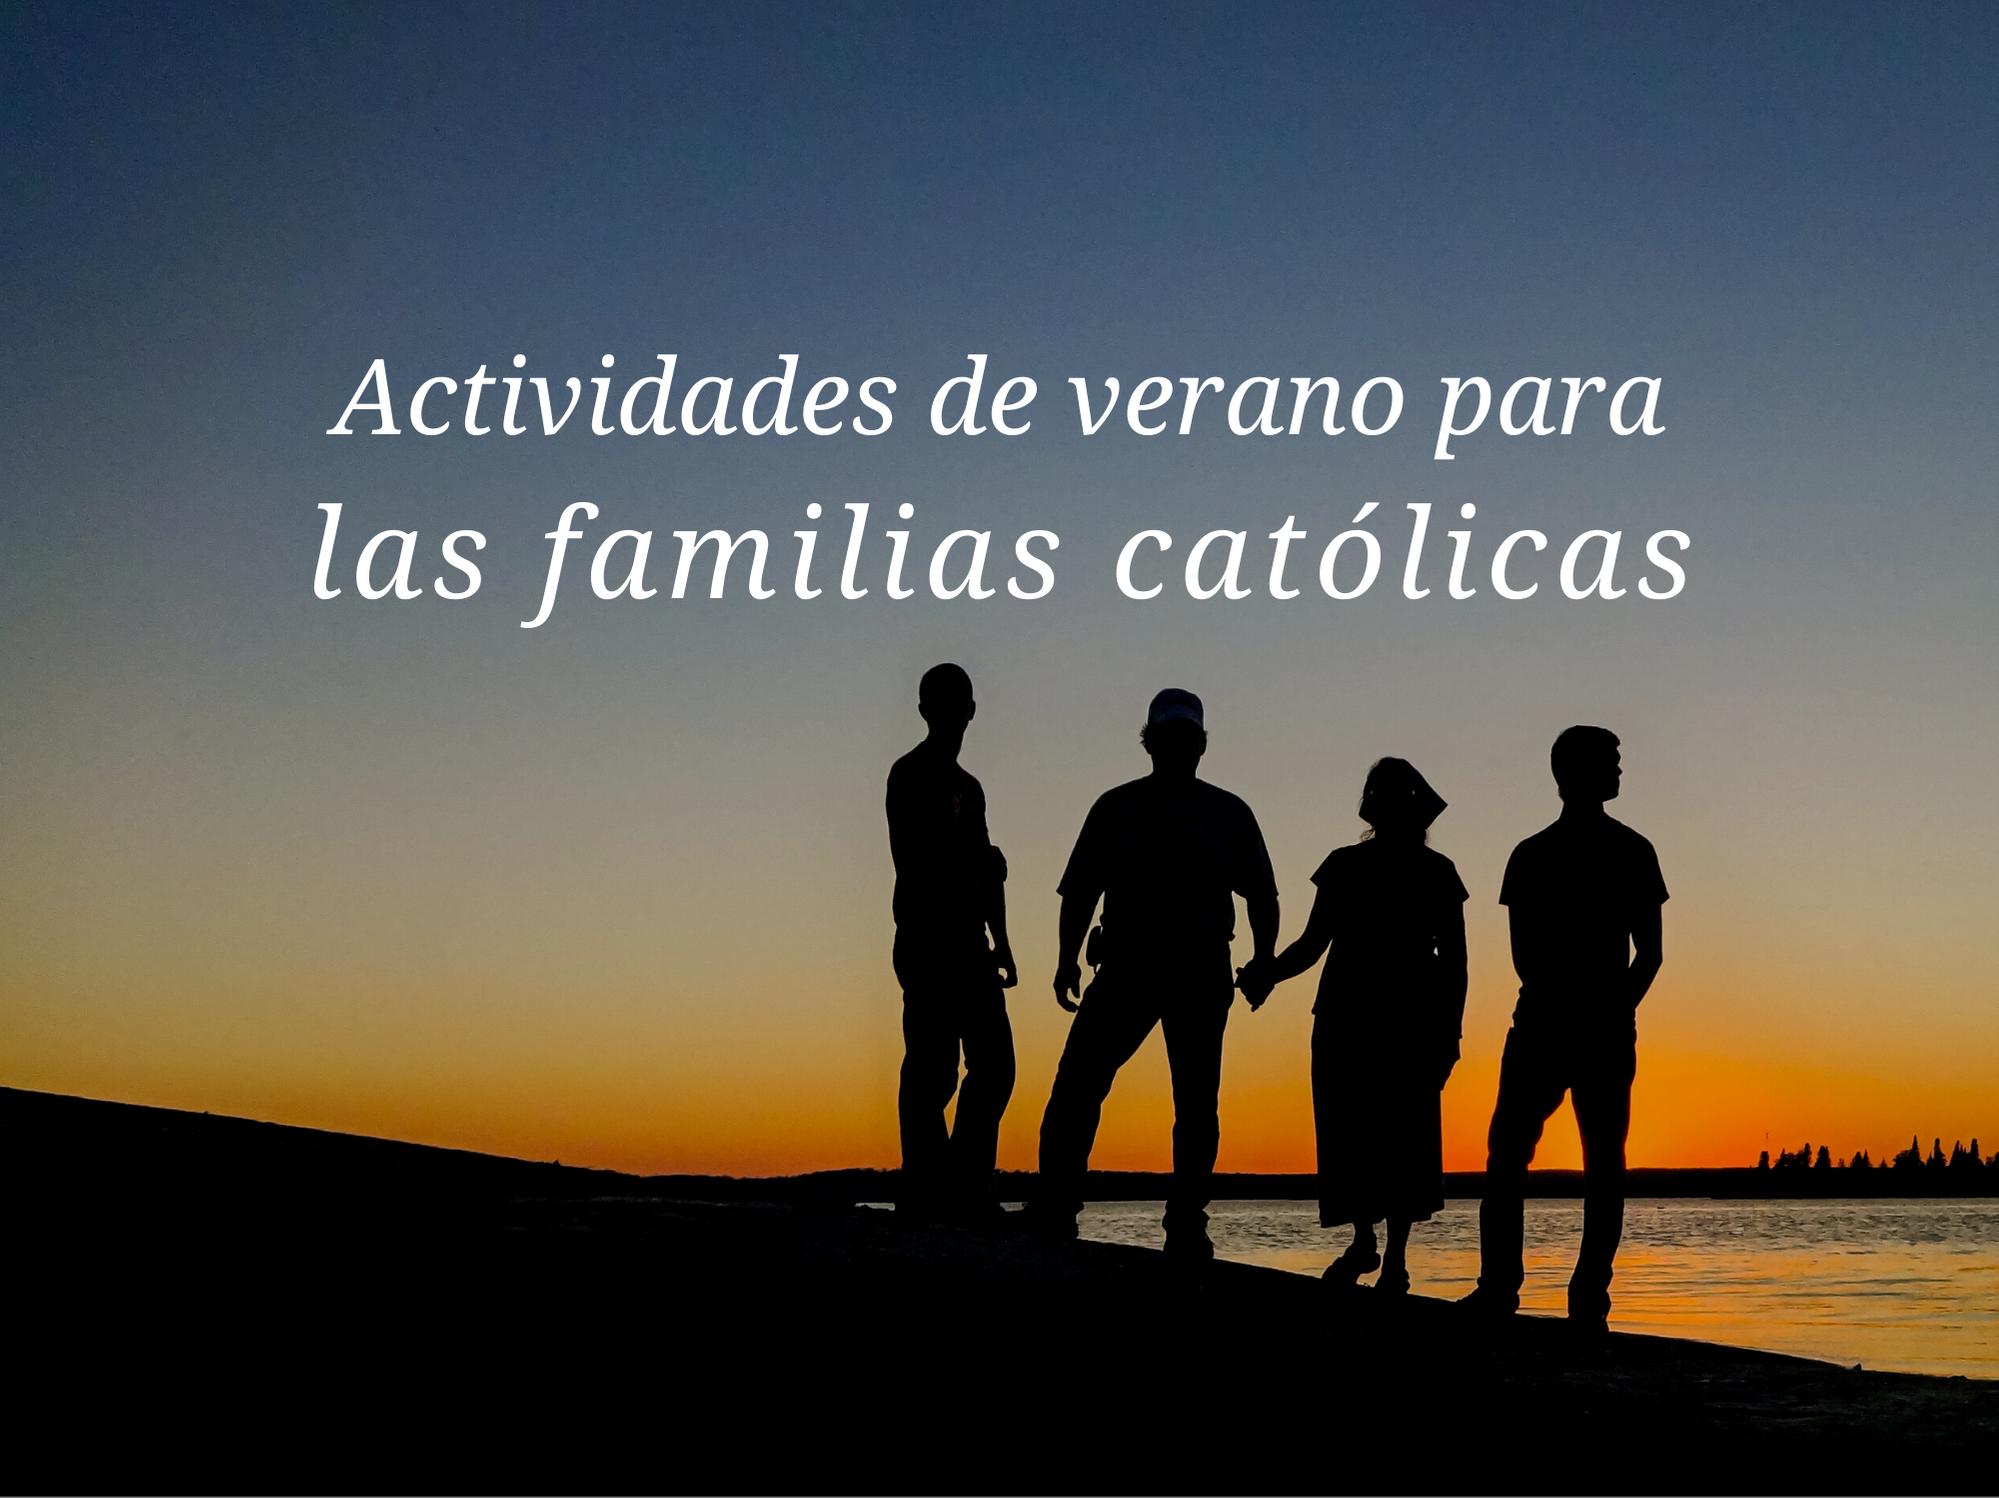 actividades-de-verano-para-las-familias-catolicas